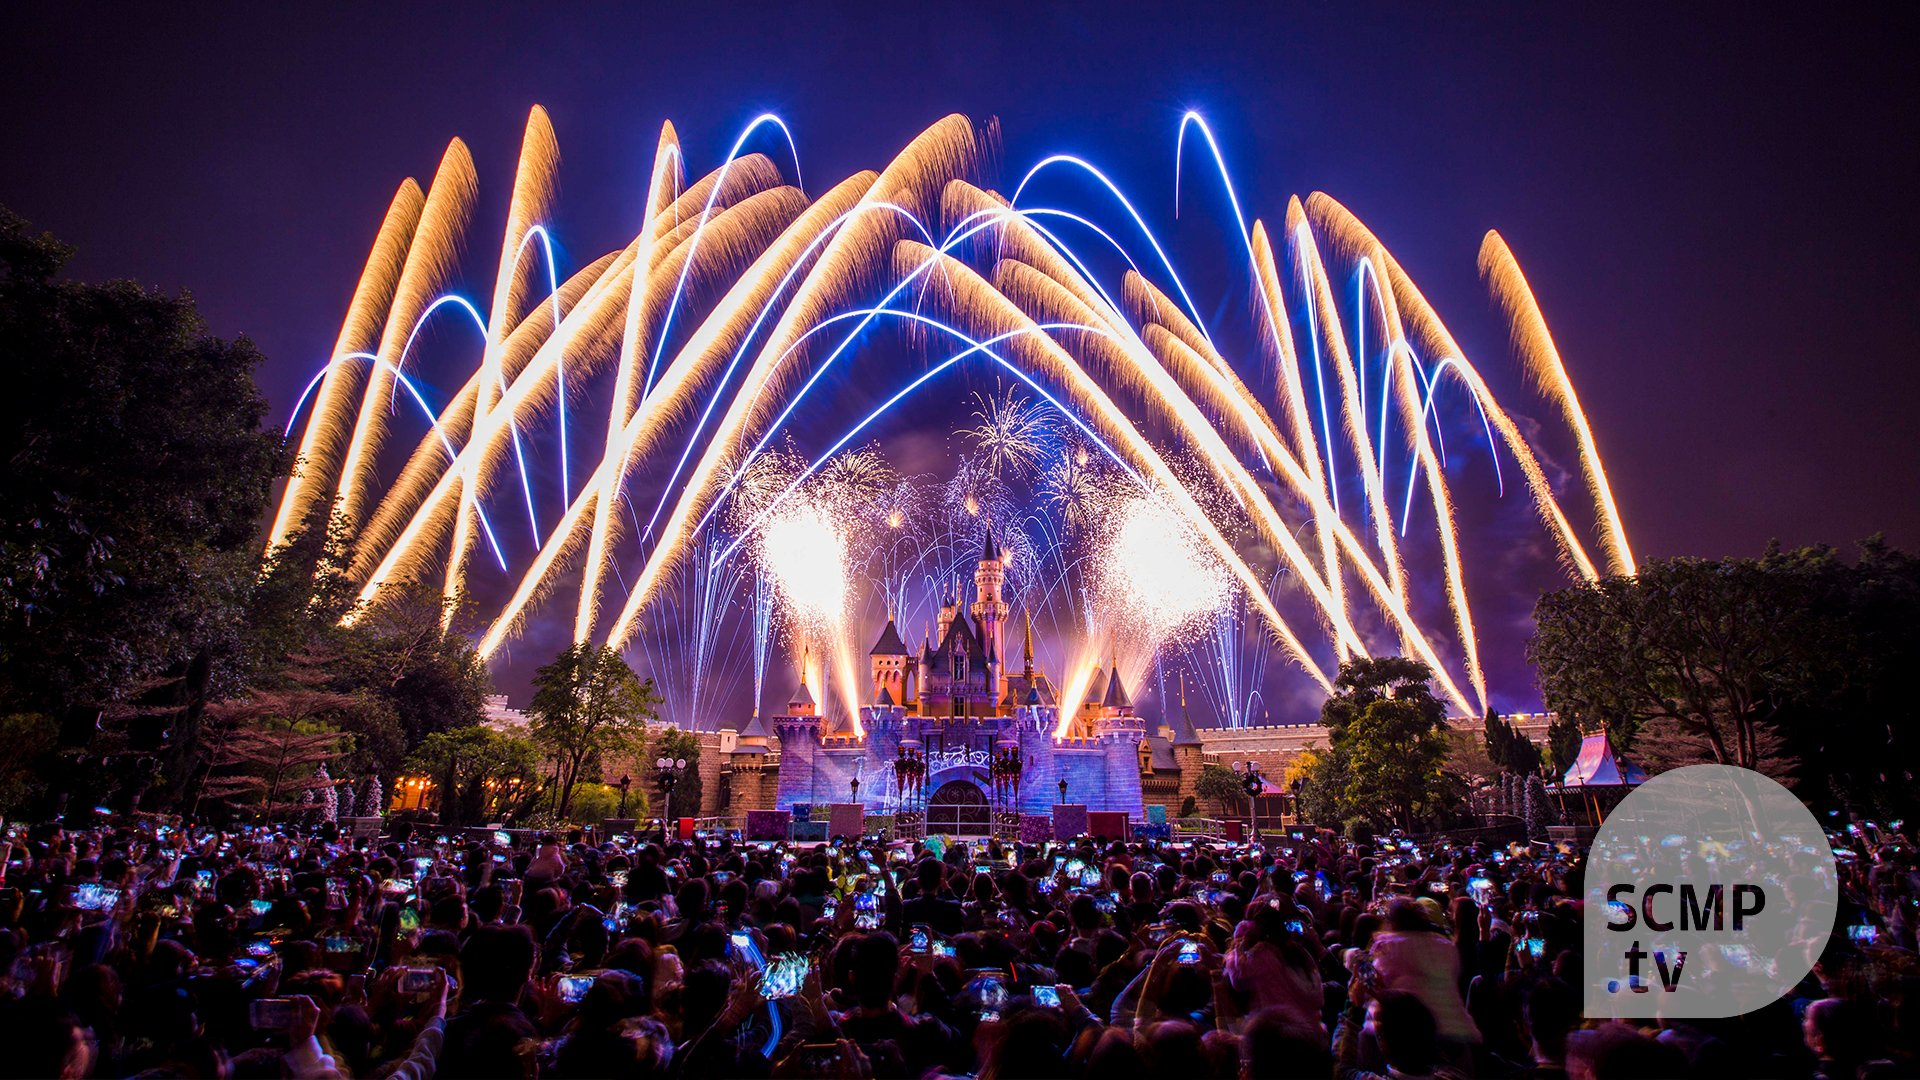 Hong Kong Disneyland Suspends Its Nightly Fireworks